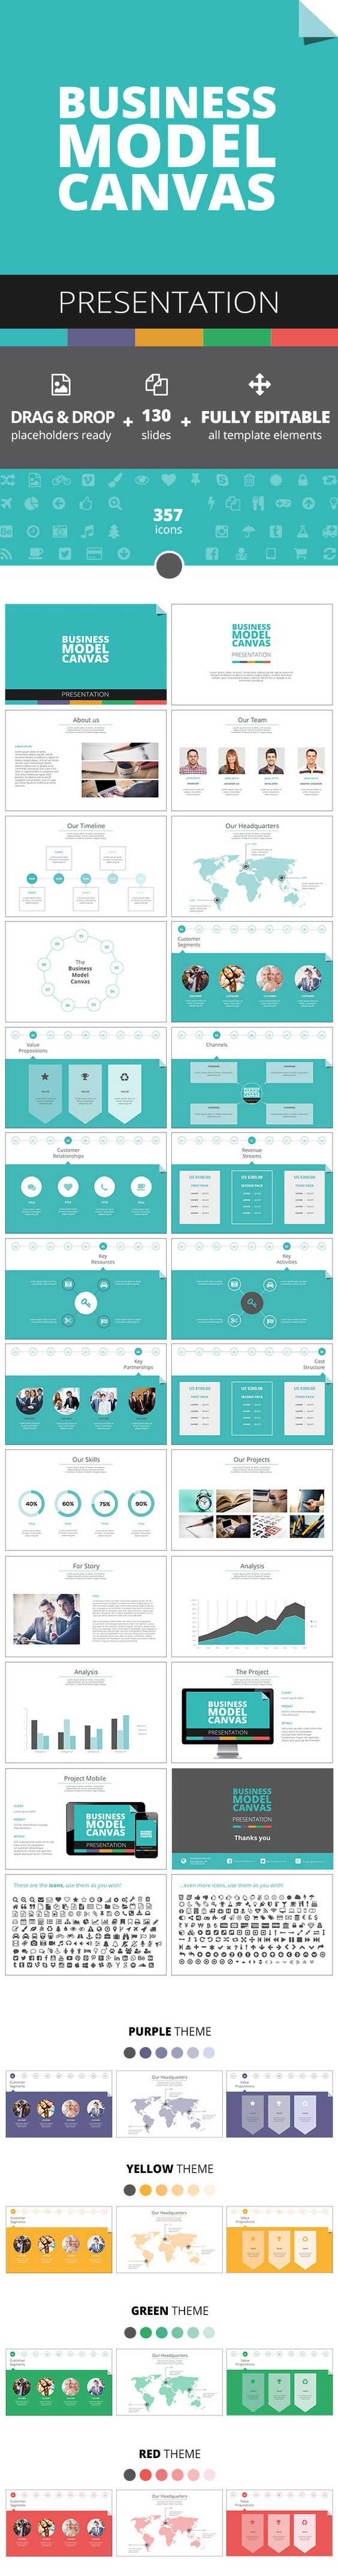 Business Model Canvas Presentation Download: http://graphicriver.net/item/business-model-canvas-presentation/11008321?ref=ksioks